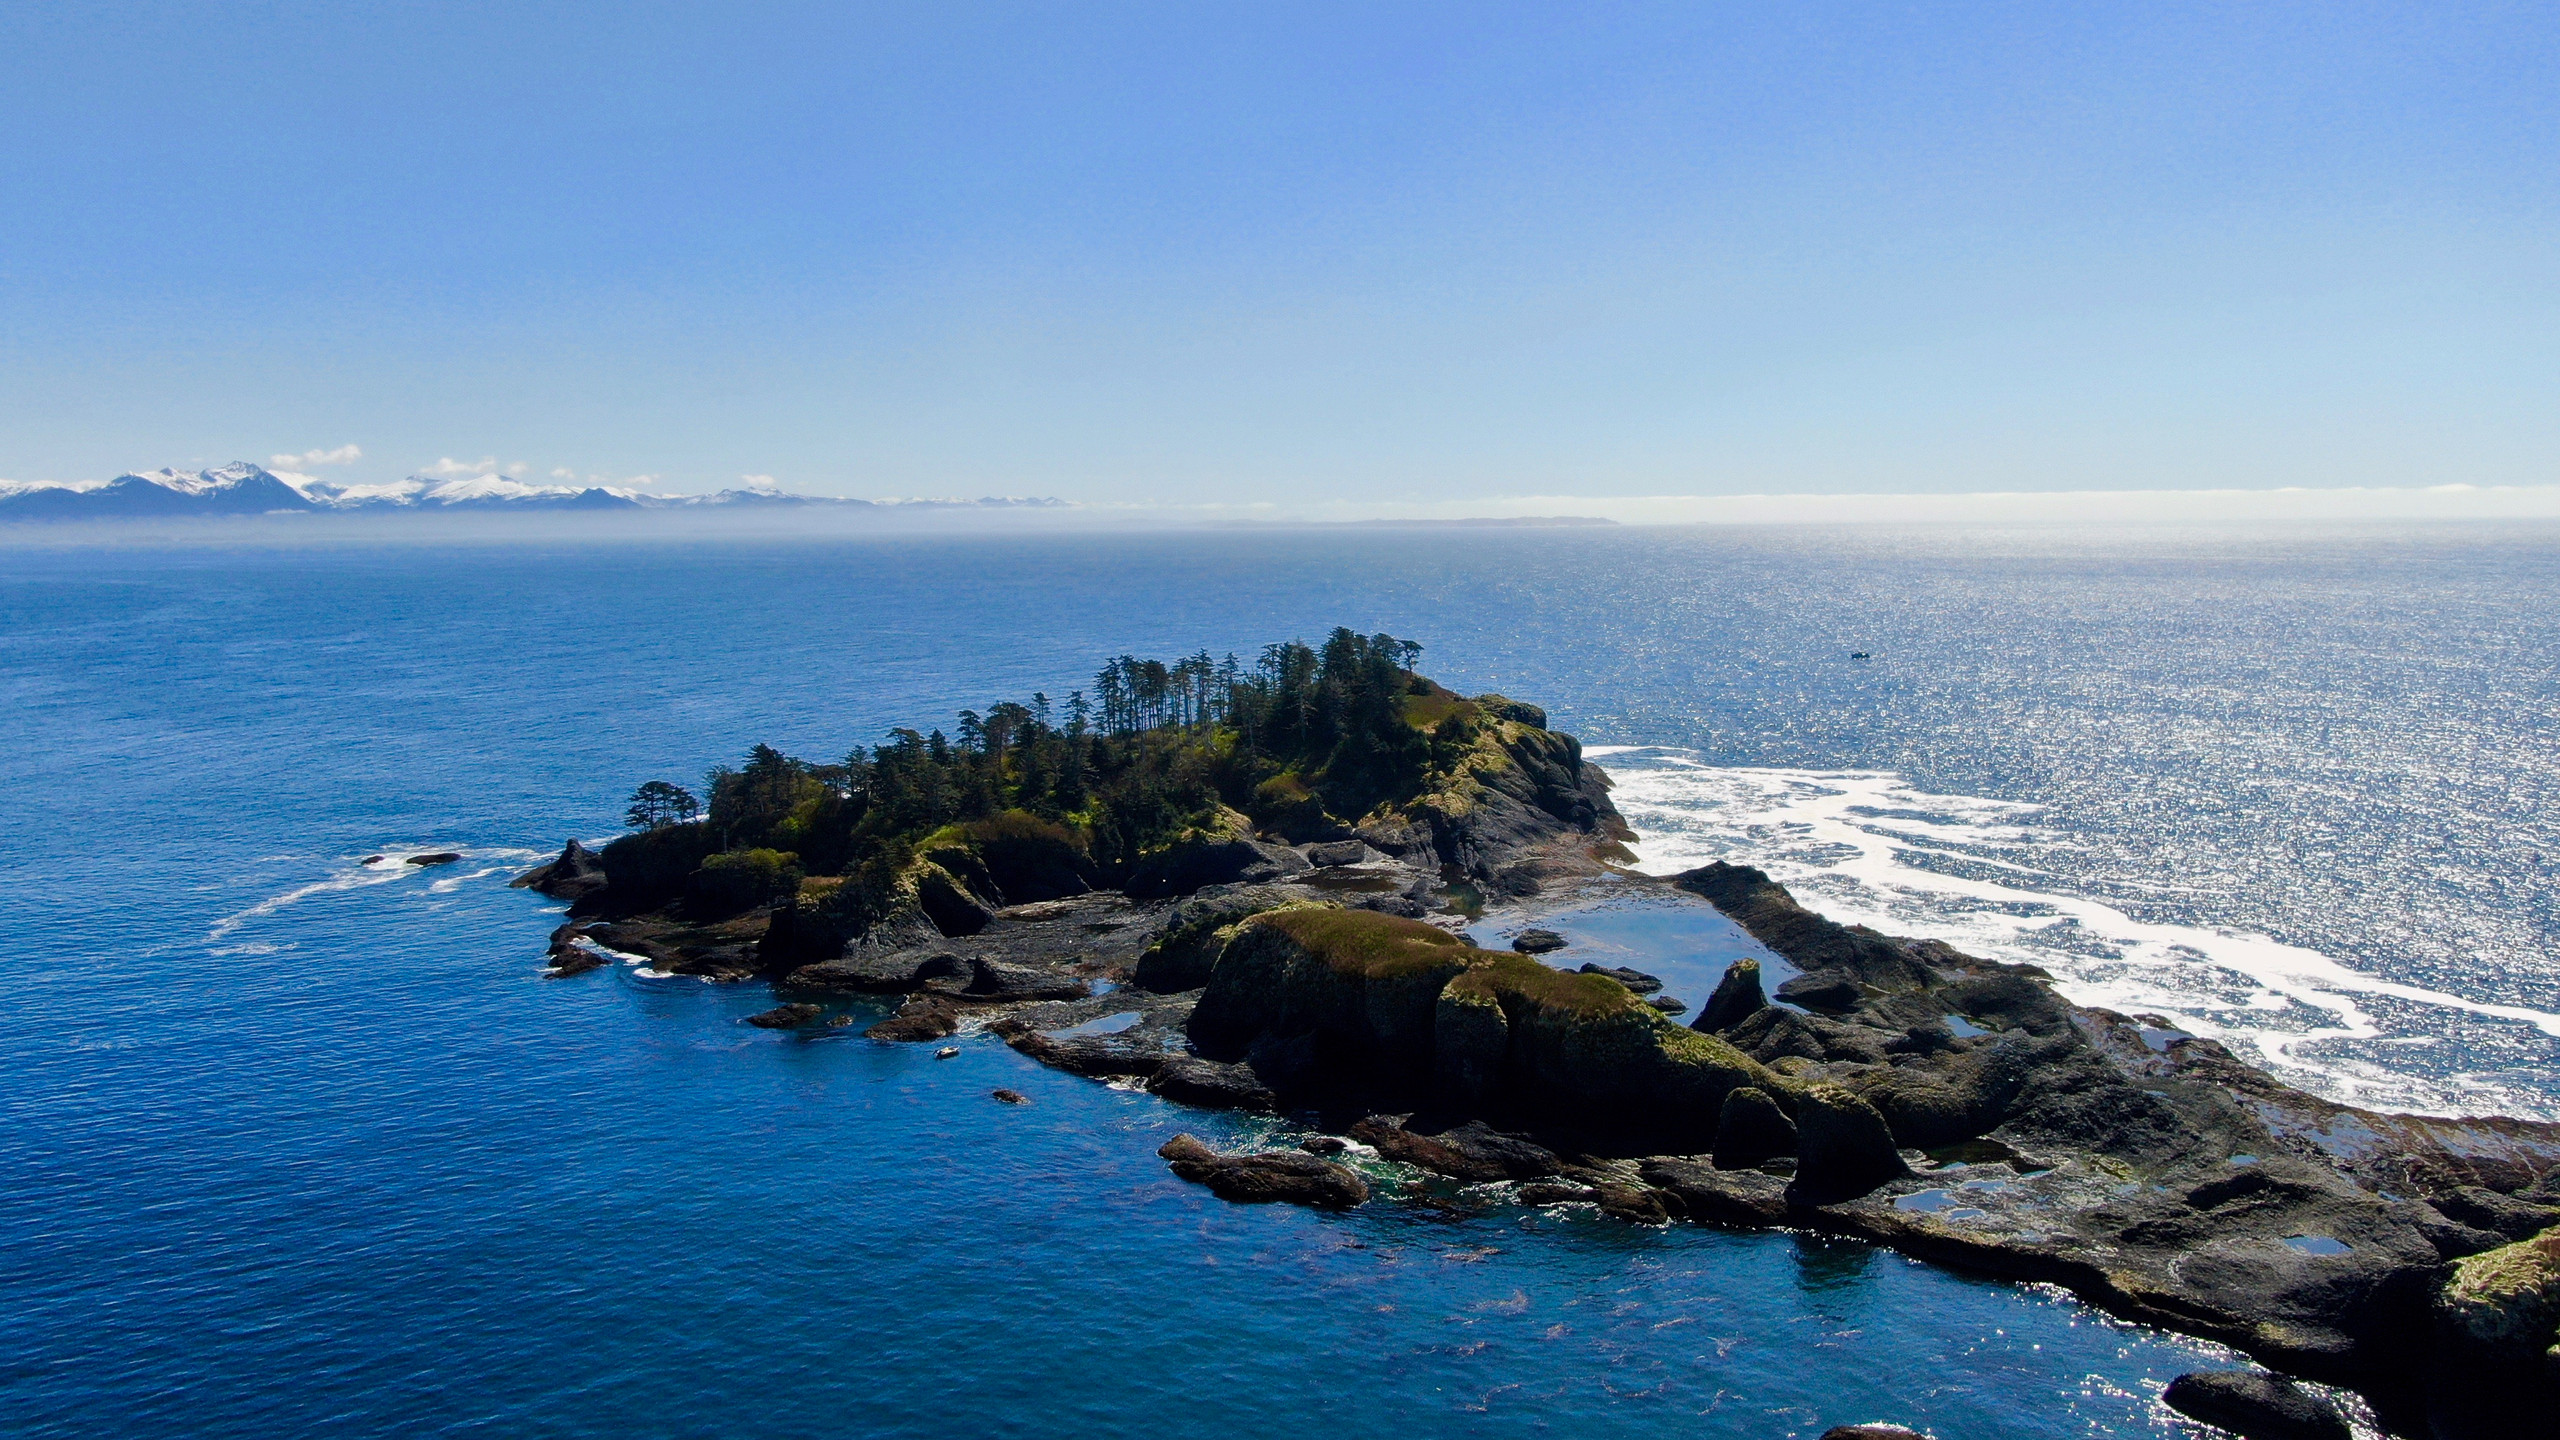 St Lazaria Island